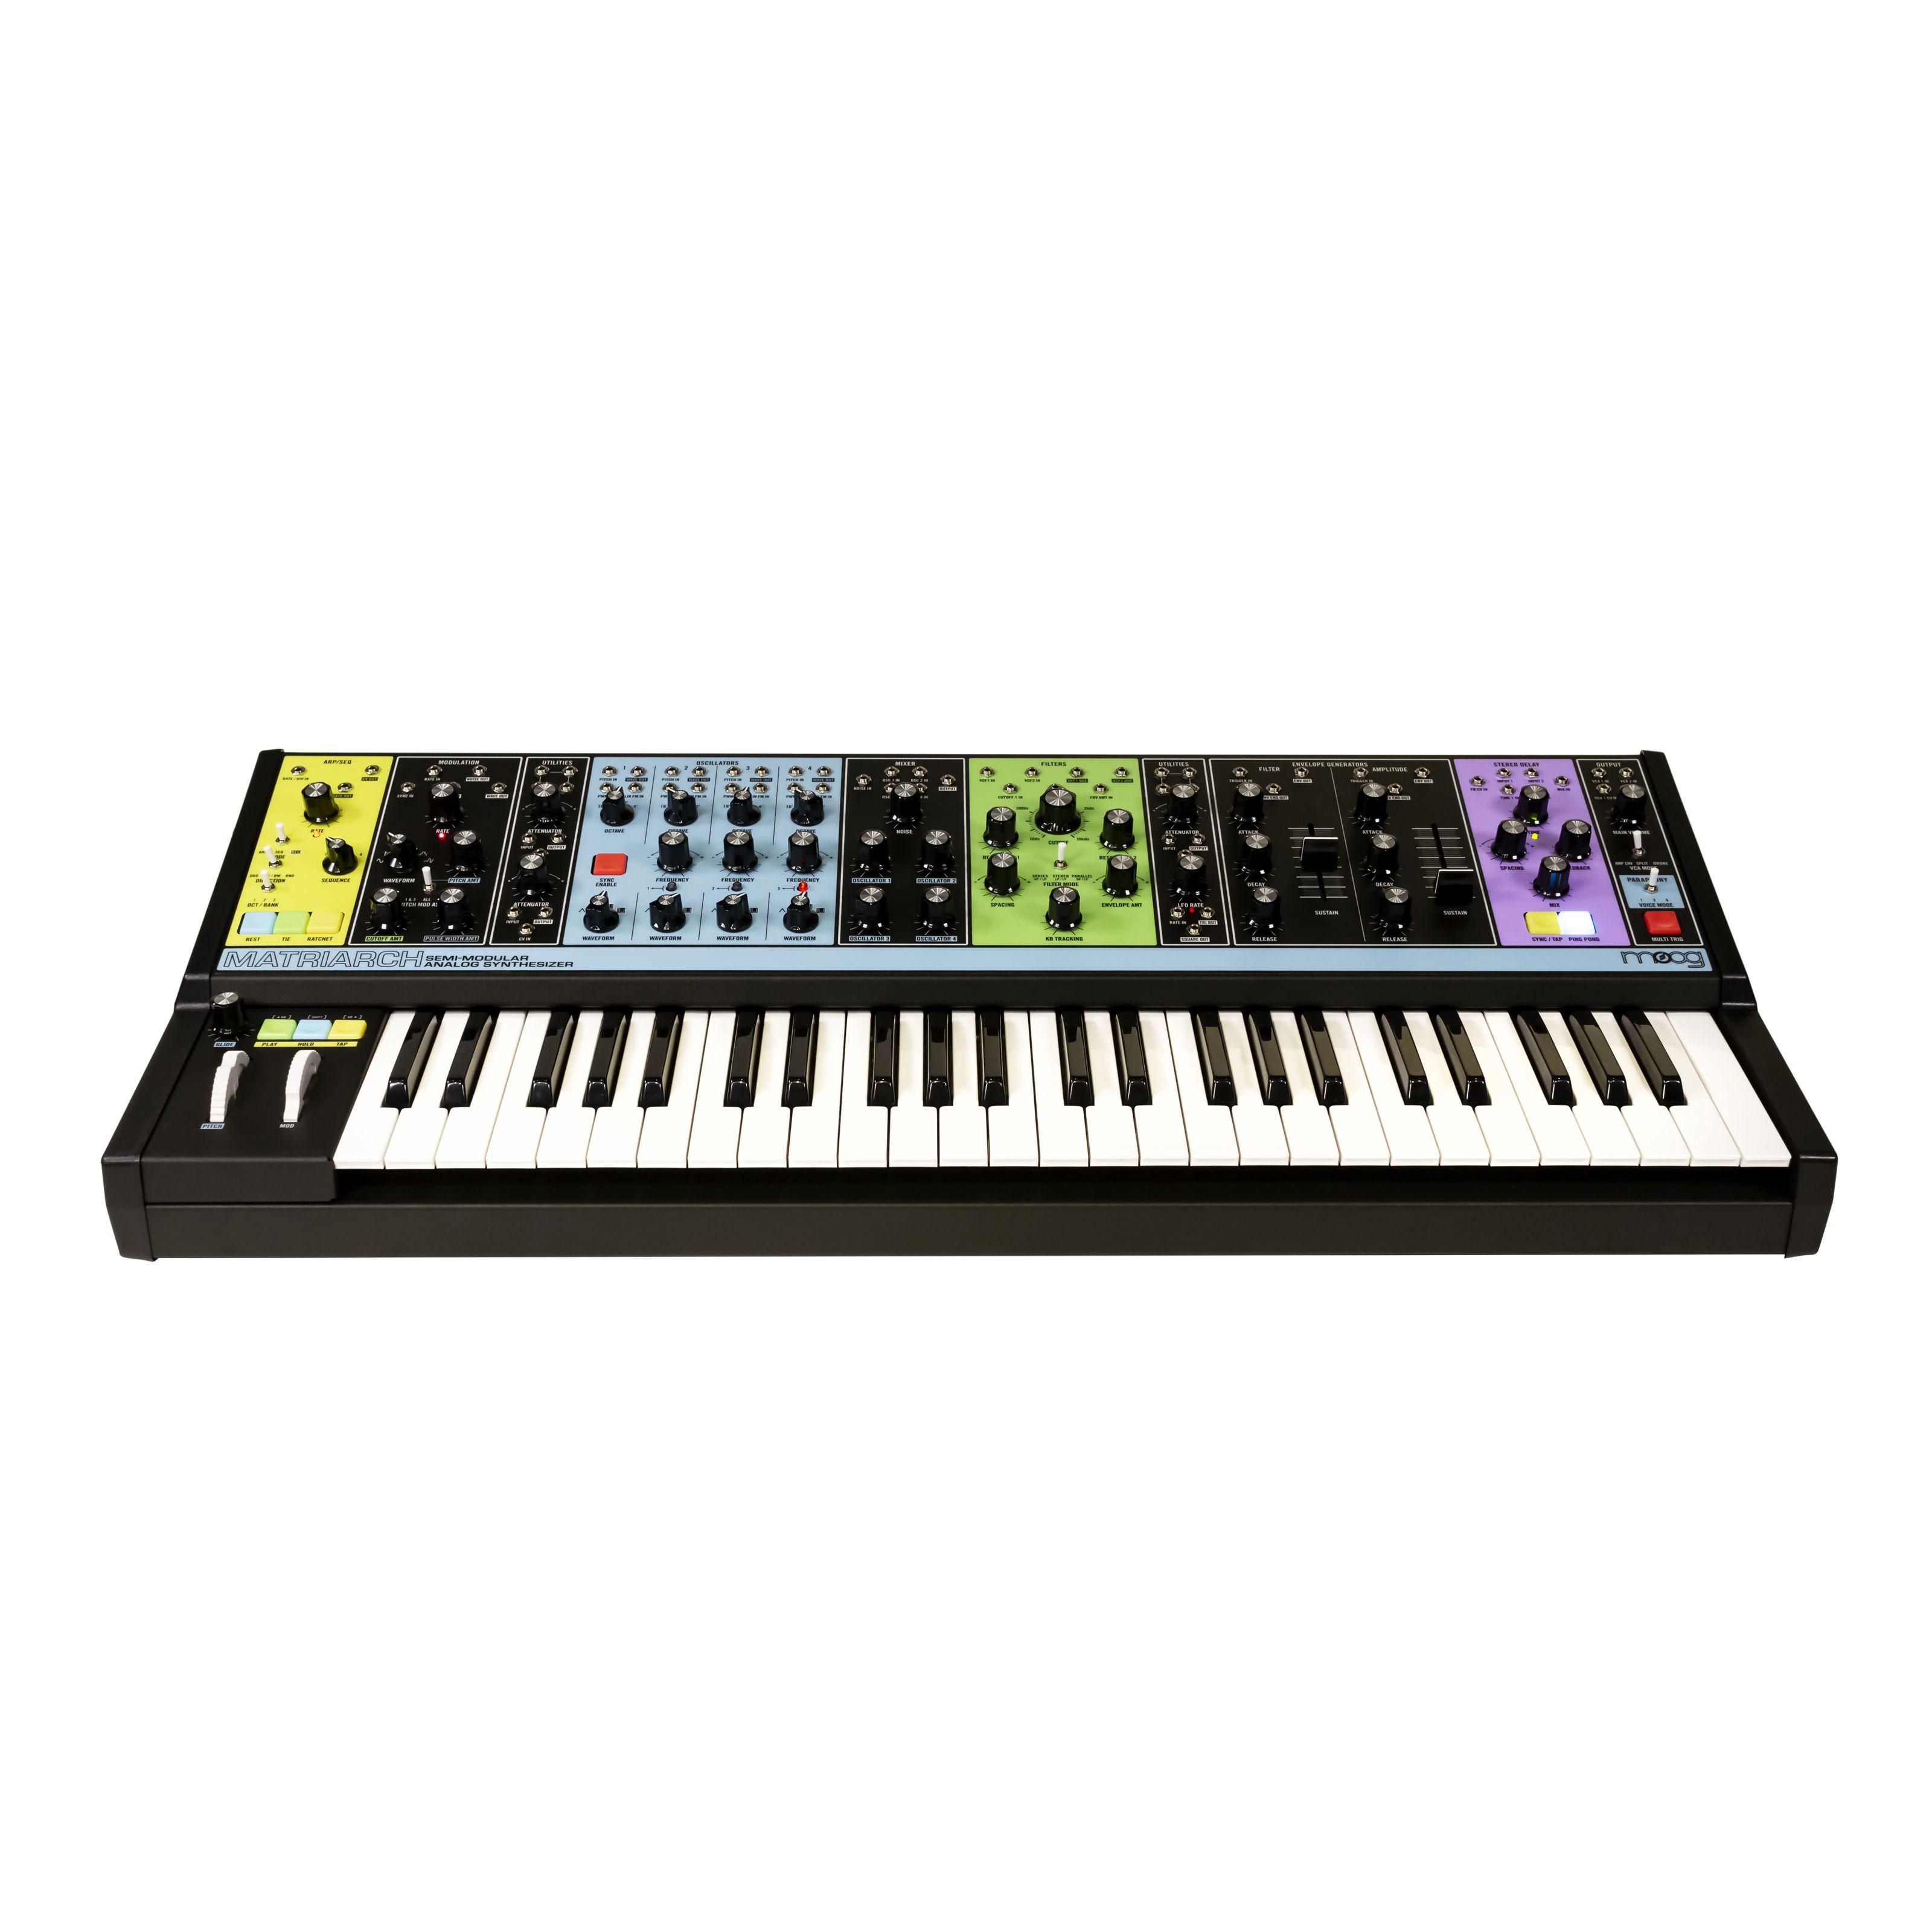 Moog - Matriarch MOD-MATR-02